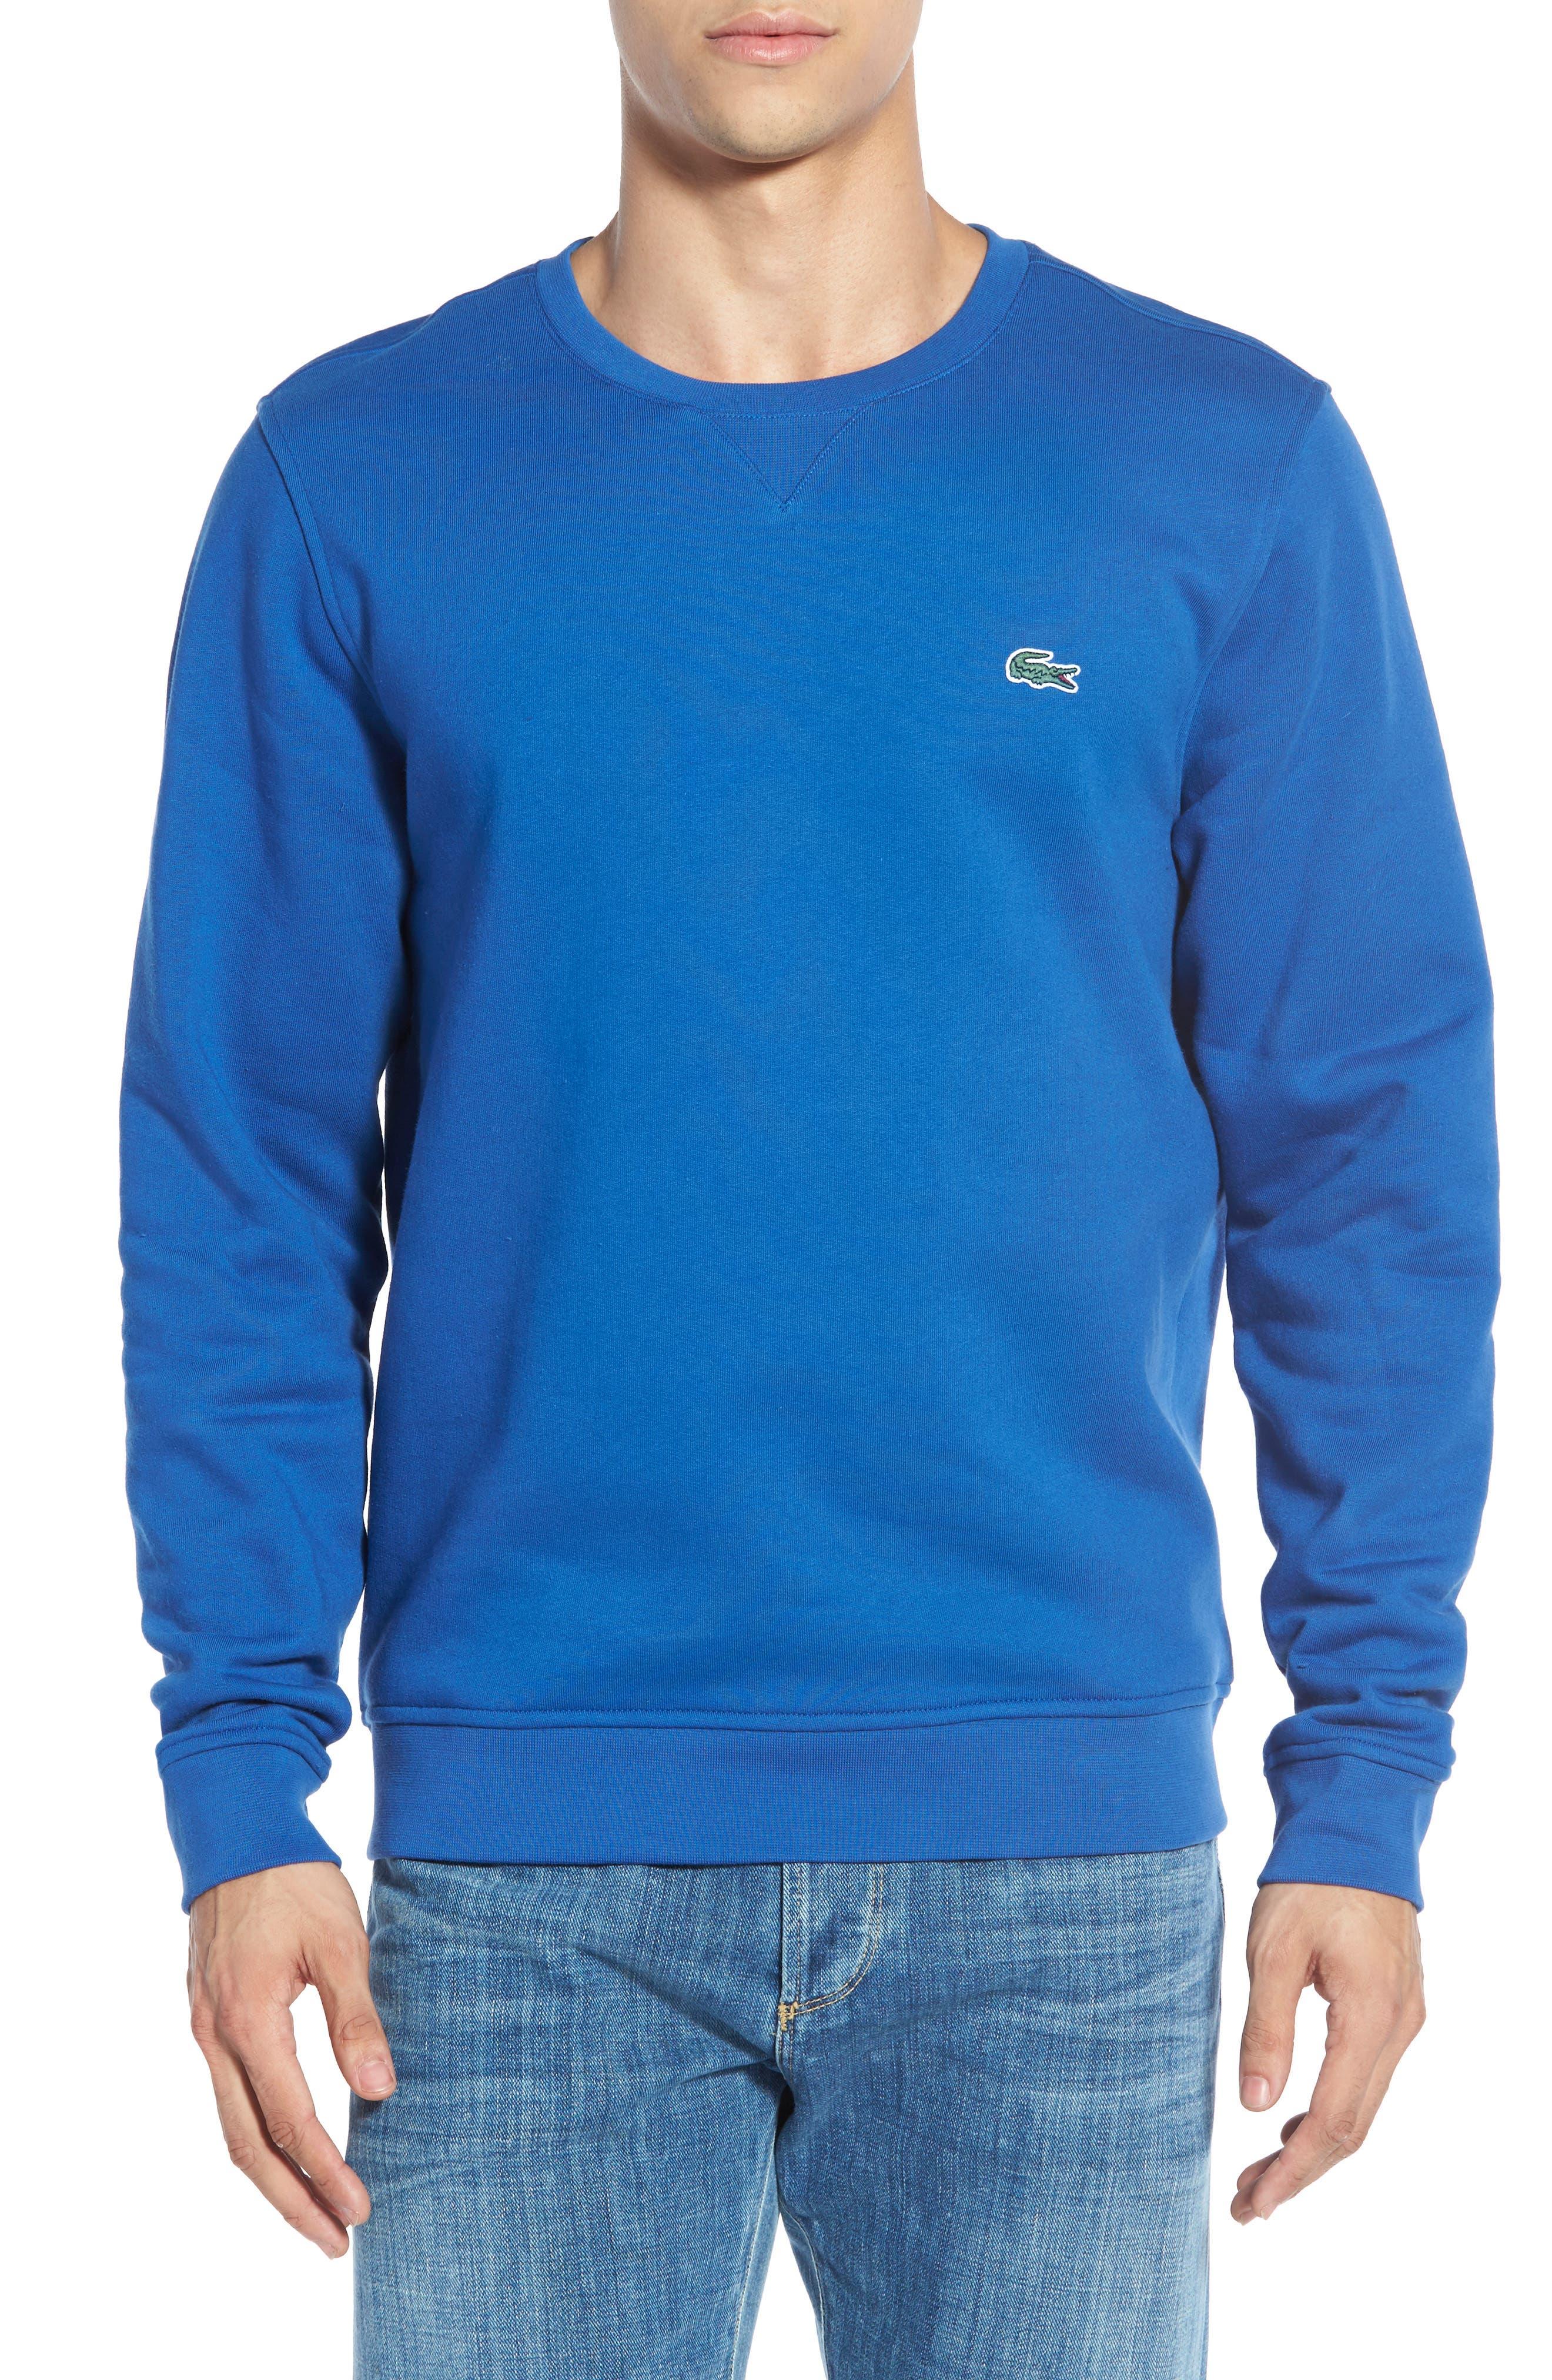 LACOSTE, 'Sport' Crewneck Sweatshirt, Main thumbnail 1, color, NAVY